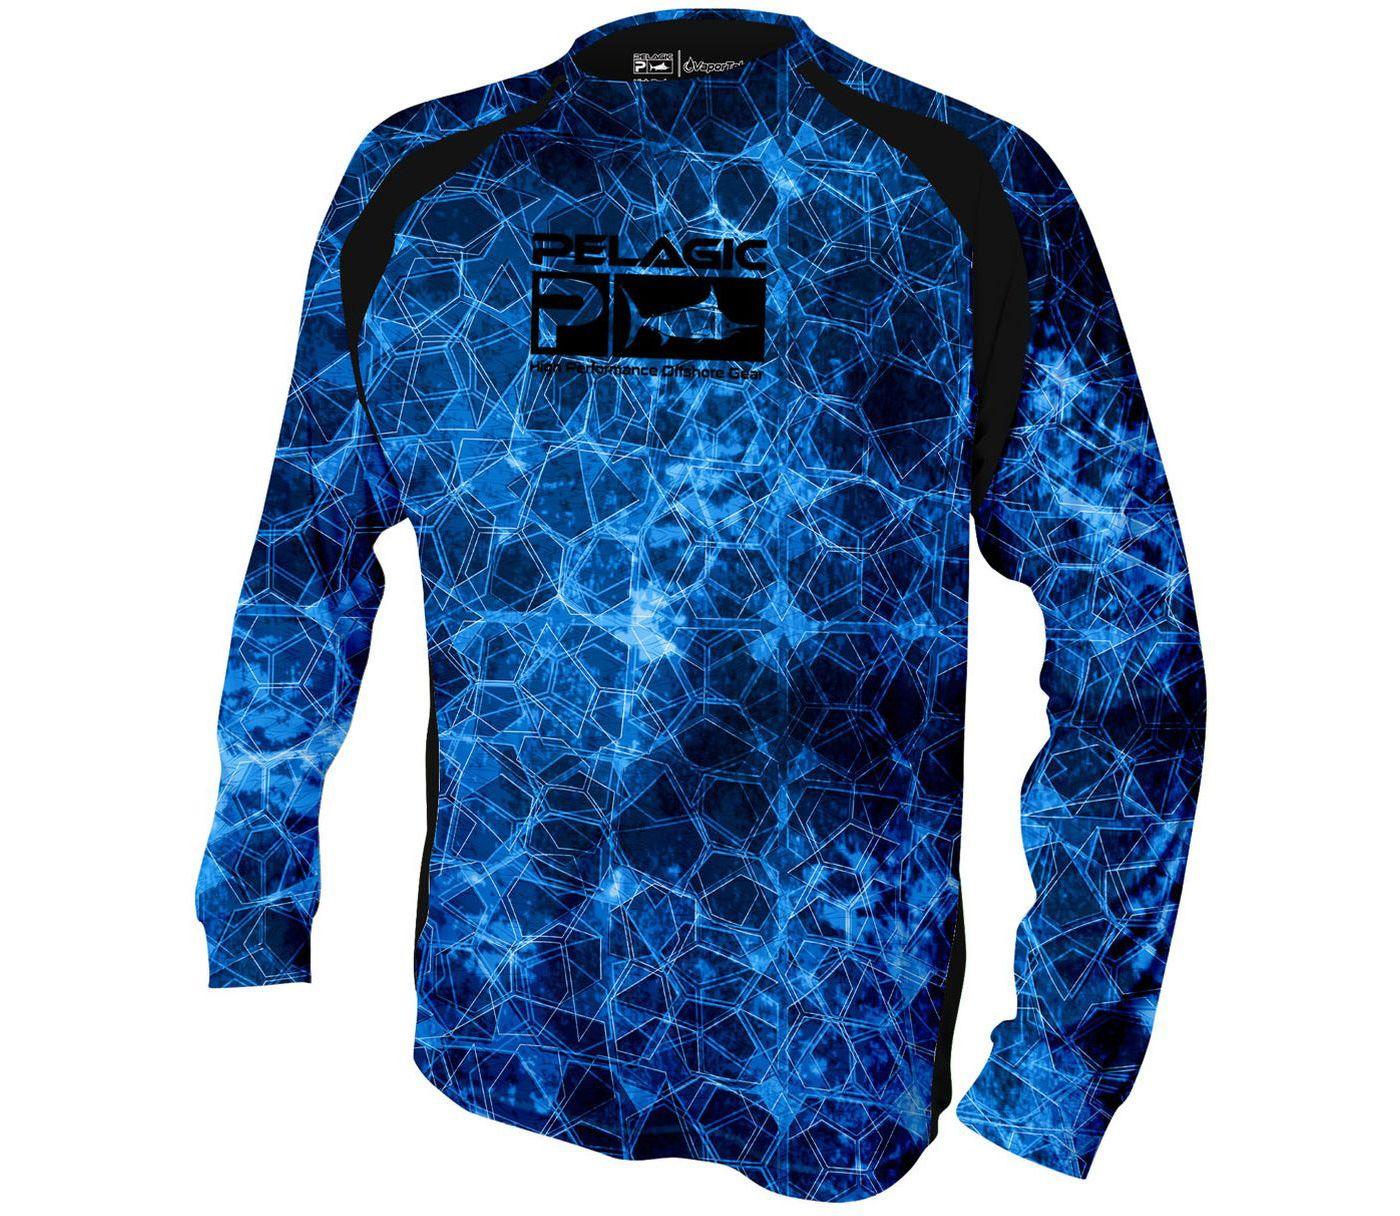 Pelagic Men's VaporTek Long Sleeve Shirt